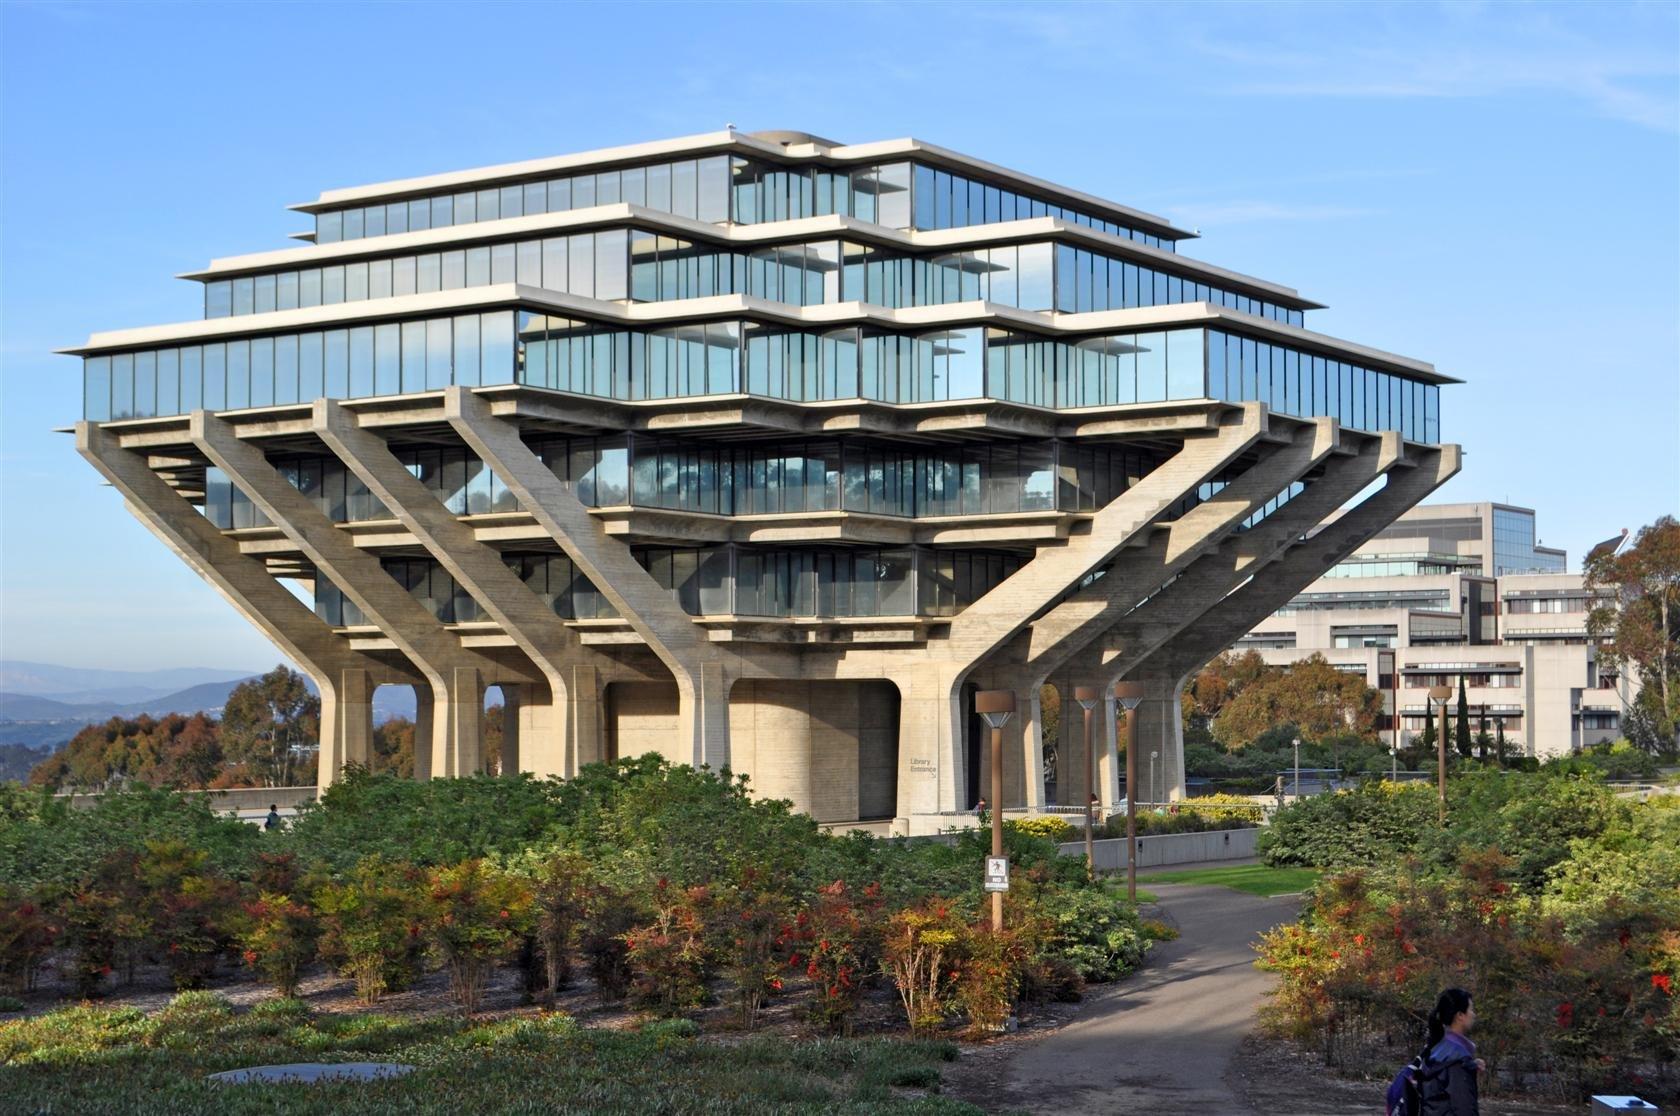 La_Jolla_-_UCSD_-_Geisel_Library_Southwest1